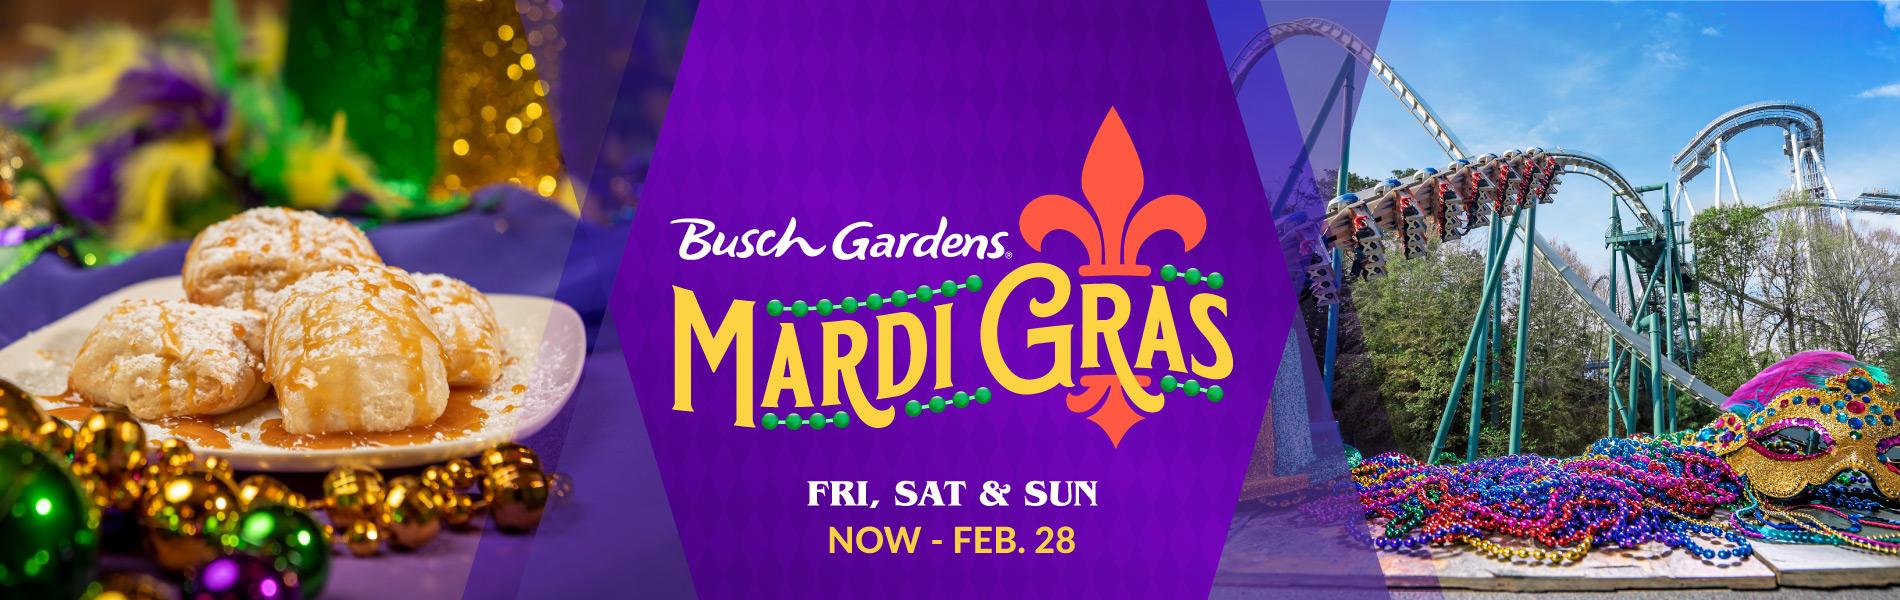 Busch Gardens Mardi Gras Event